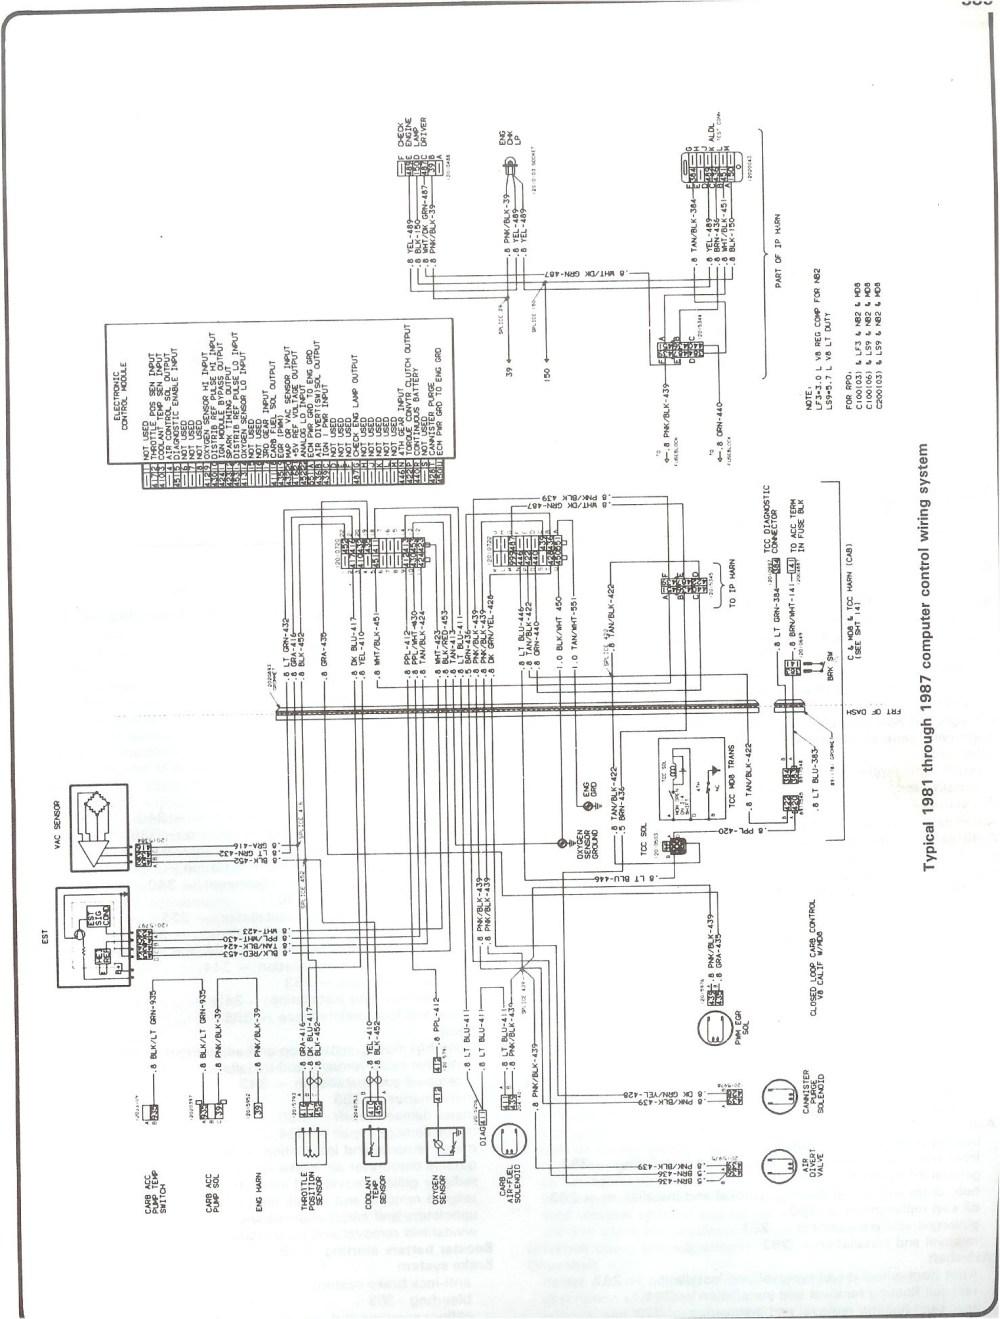 medium resolution of 82 chevy c10 fuse diagram electrical drawing wiring diagram u2022 2004 chevy colorado fuse box